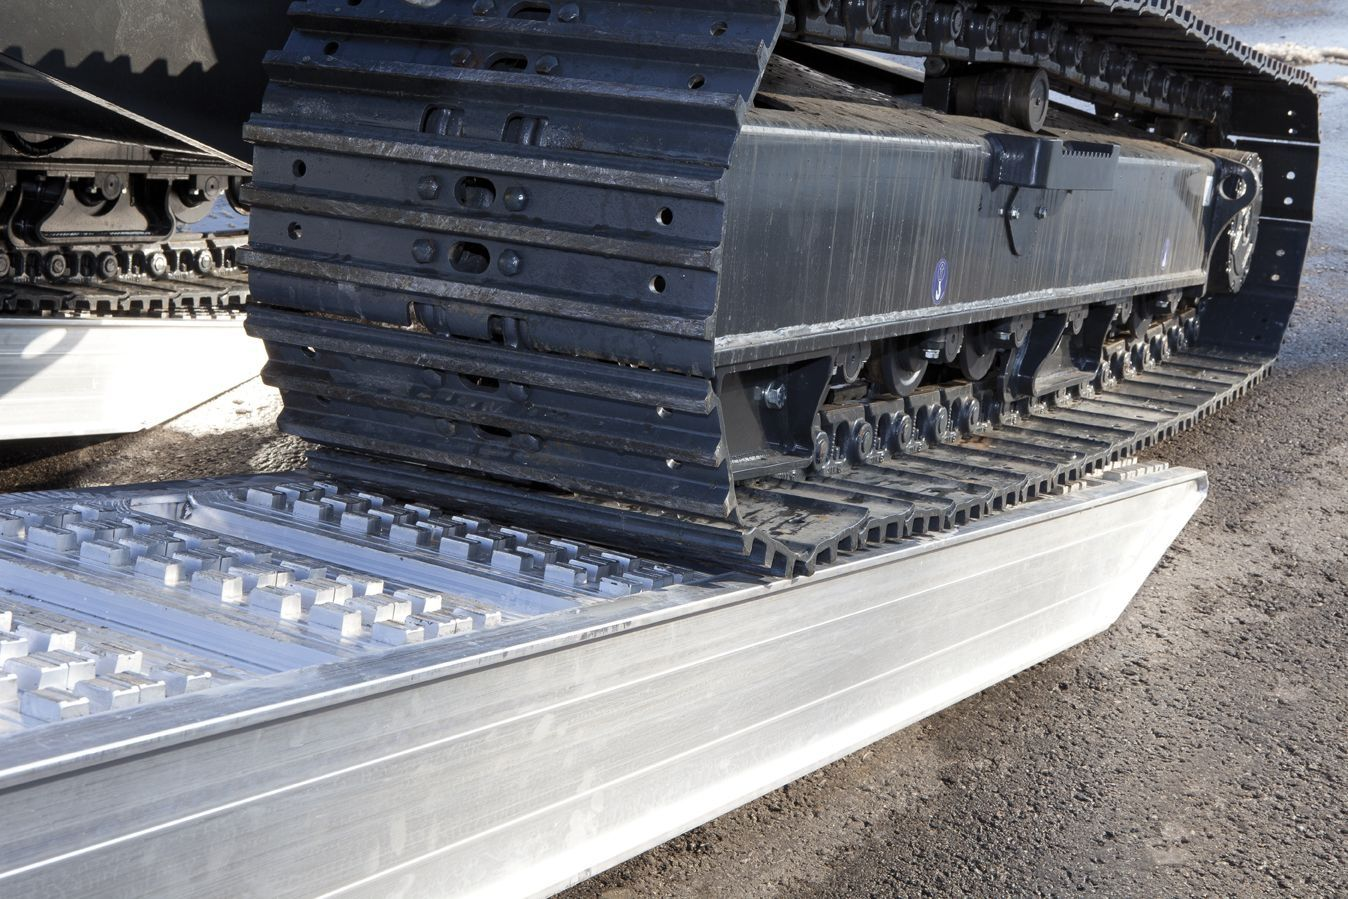 aluminum loading ramp 2 500 4 500 mm 3 000 12 173 kg - Aluminum Ramps